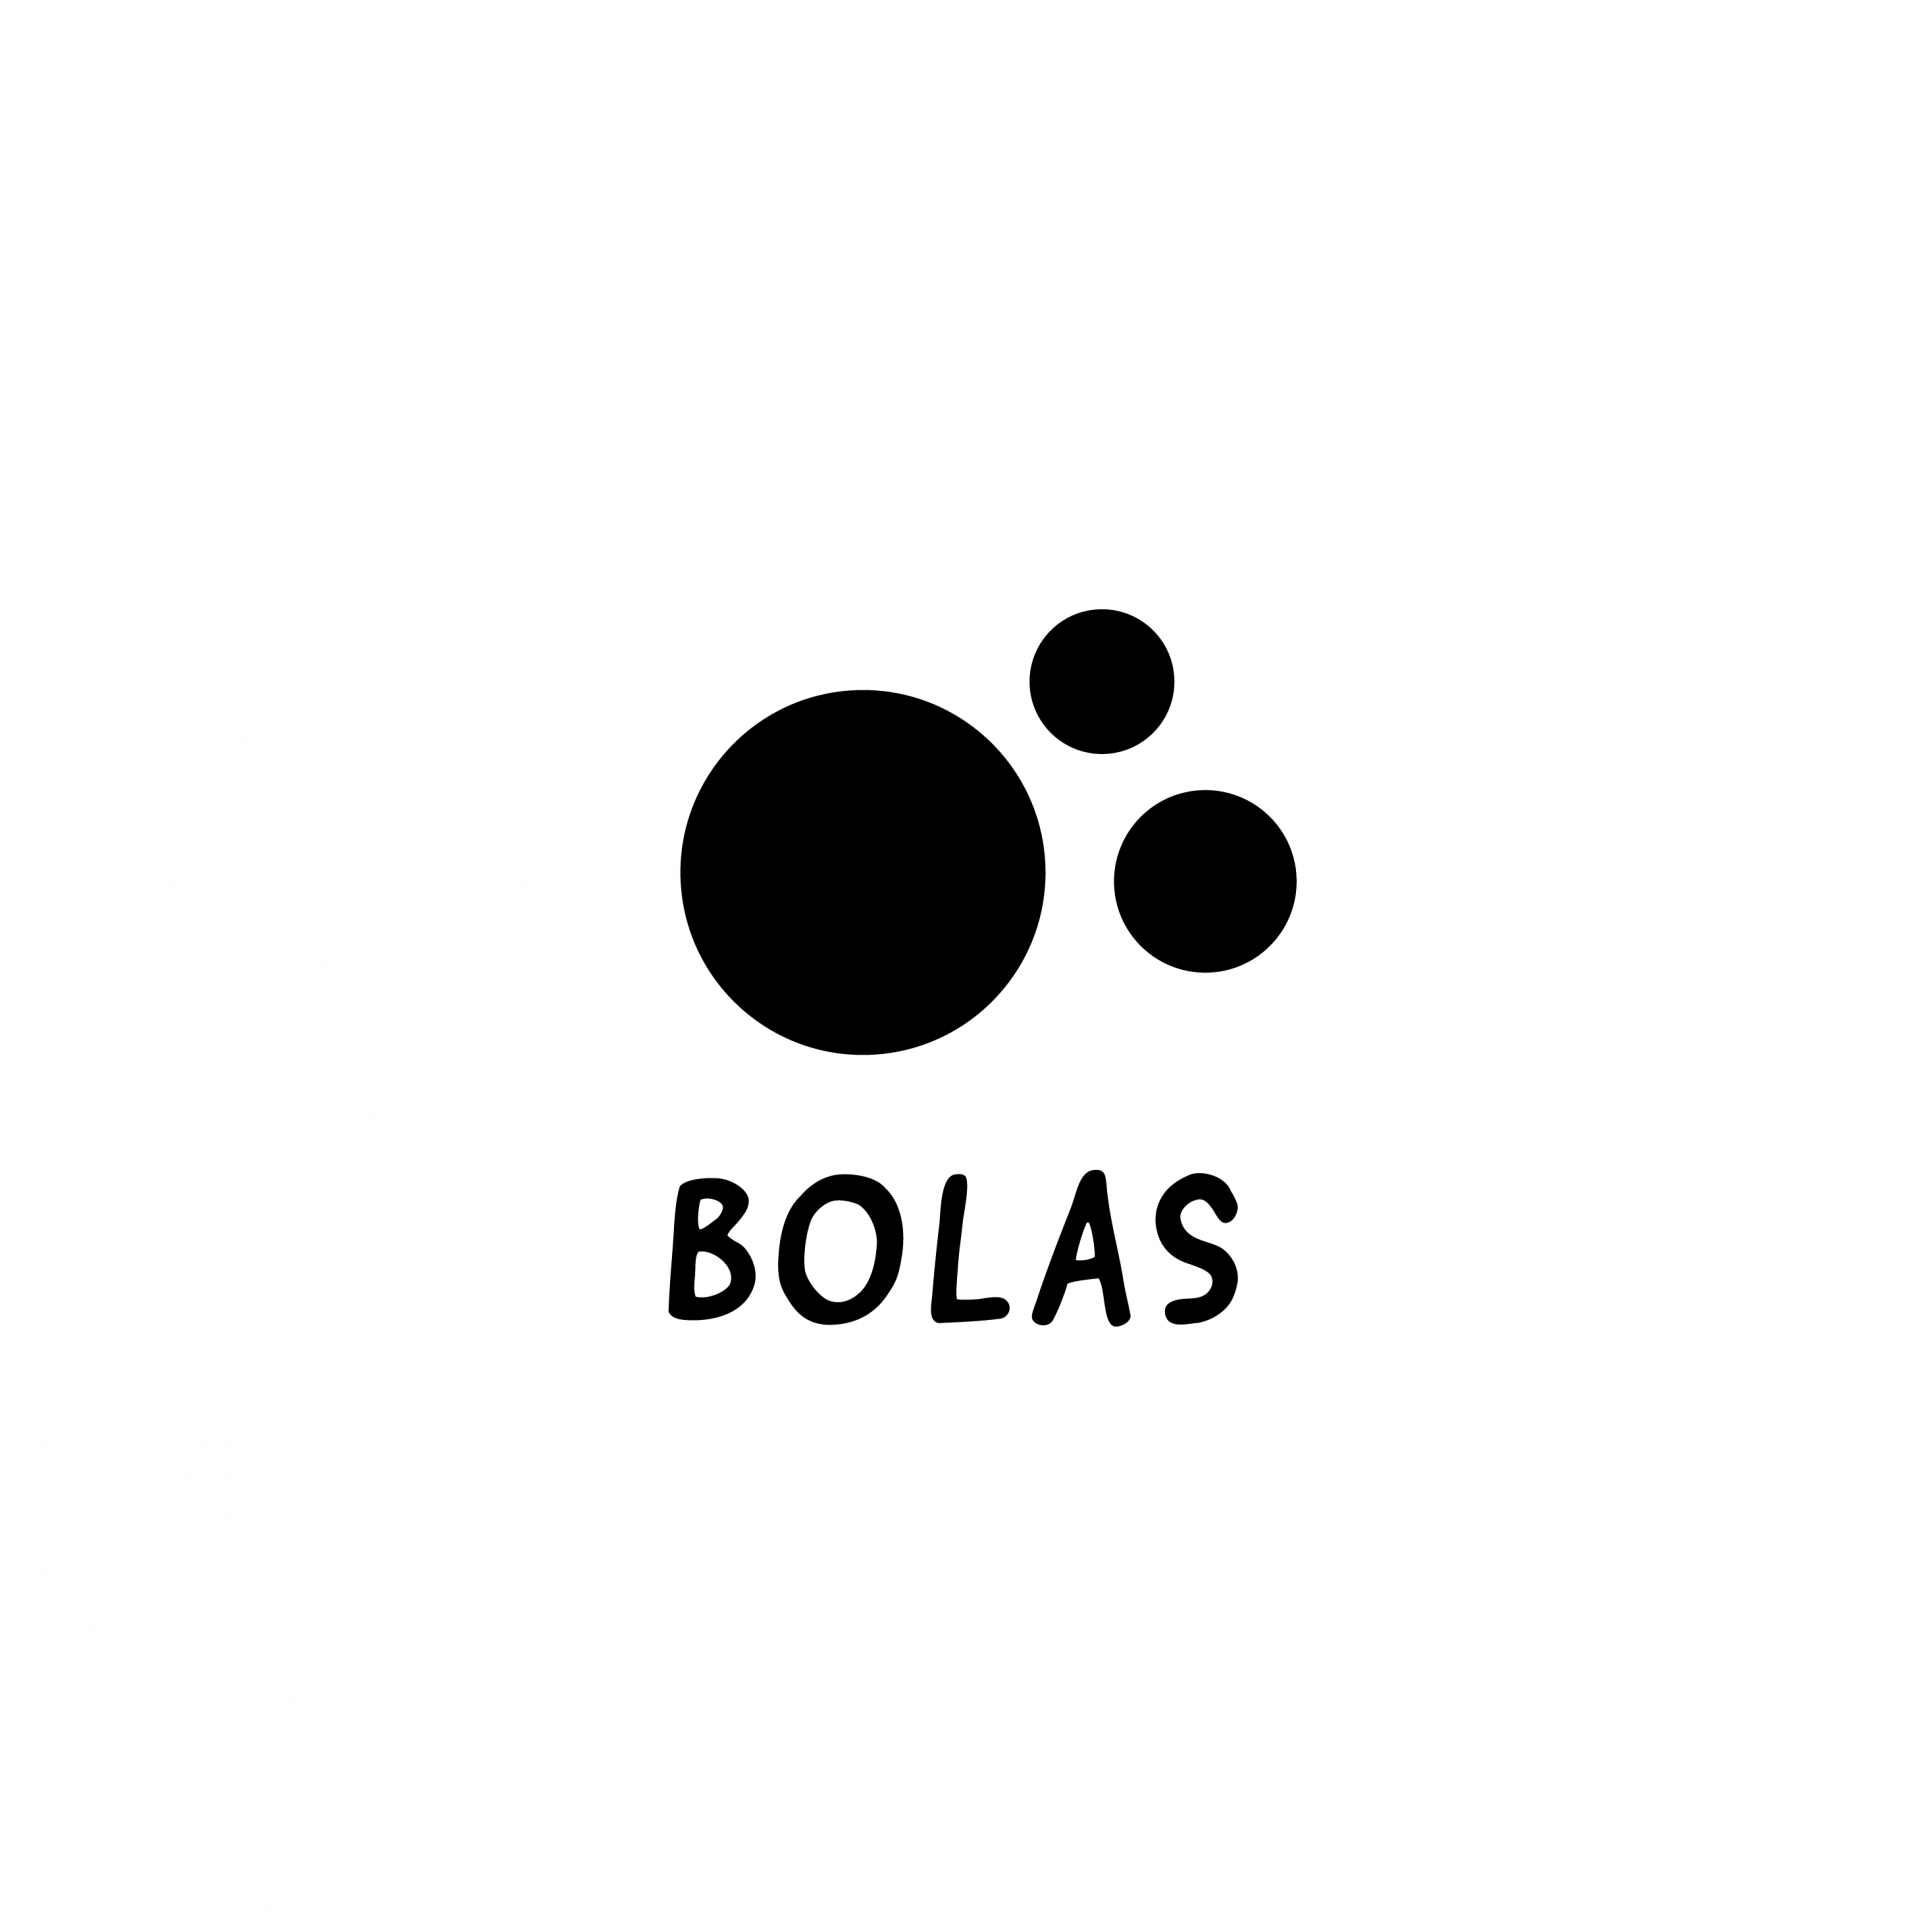 Bolas 01